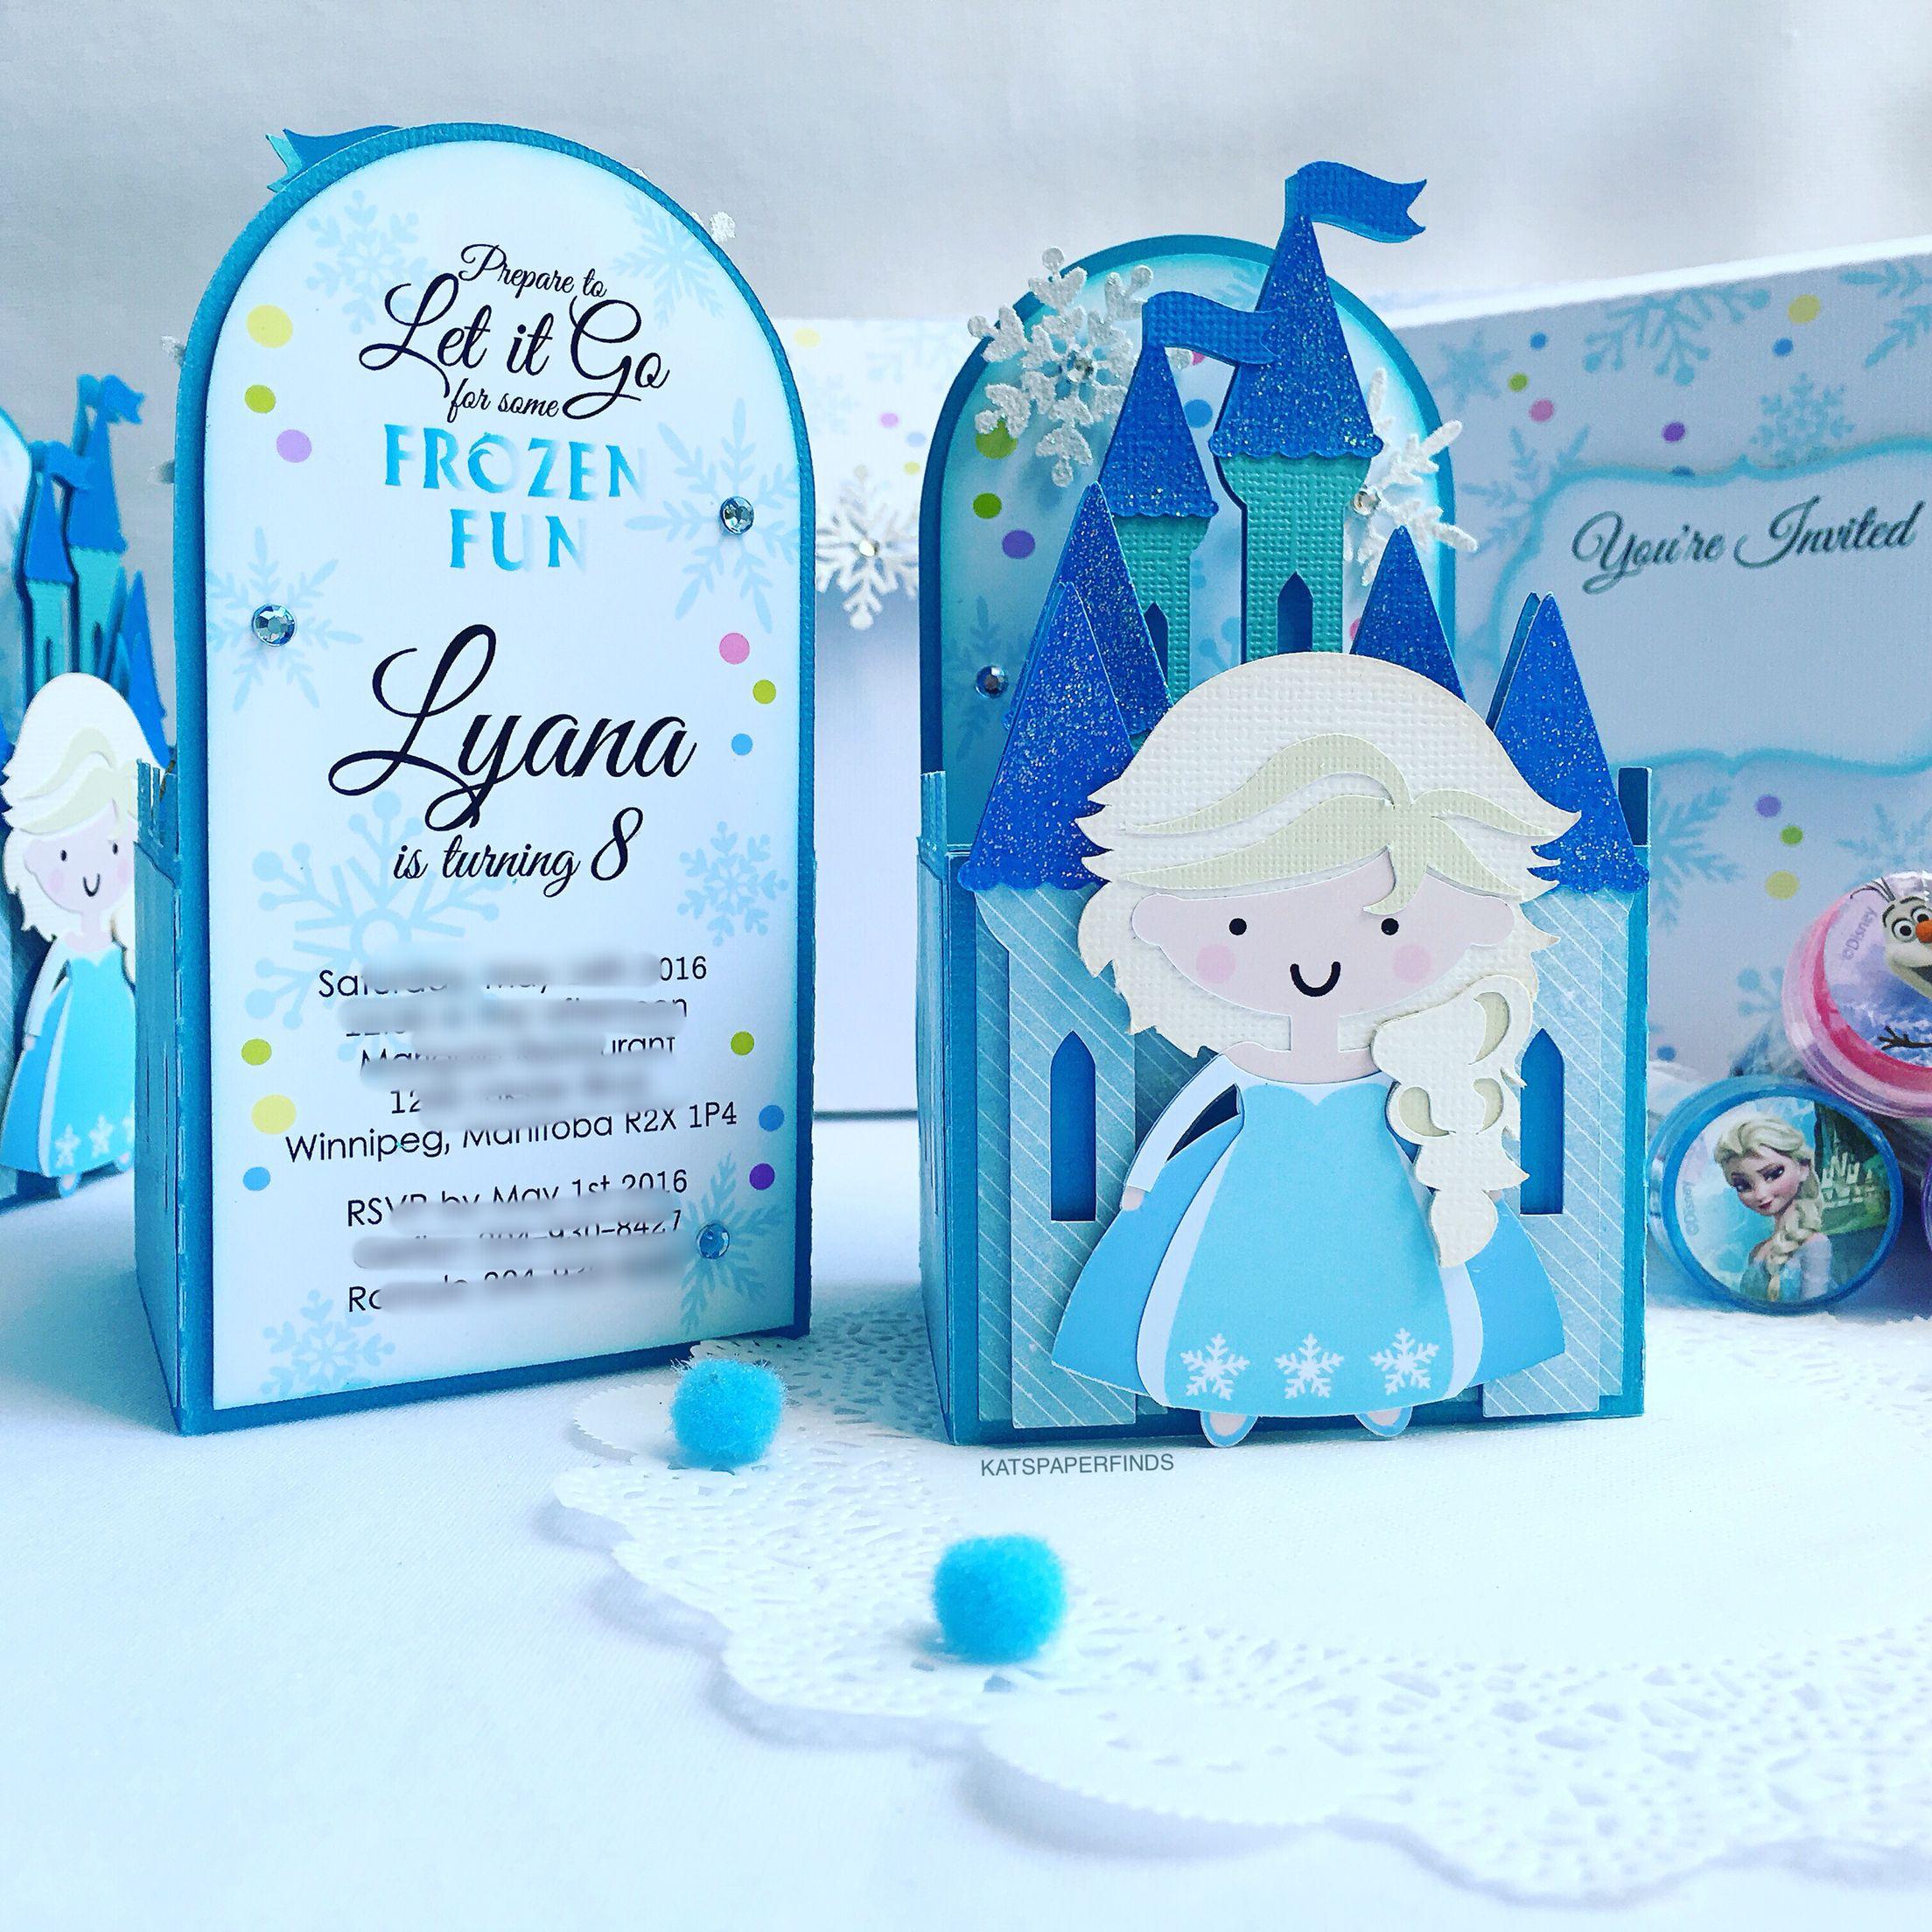 ❄️Frozen❄️ themed castle box invitations for Lyana's 8th birthday!